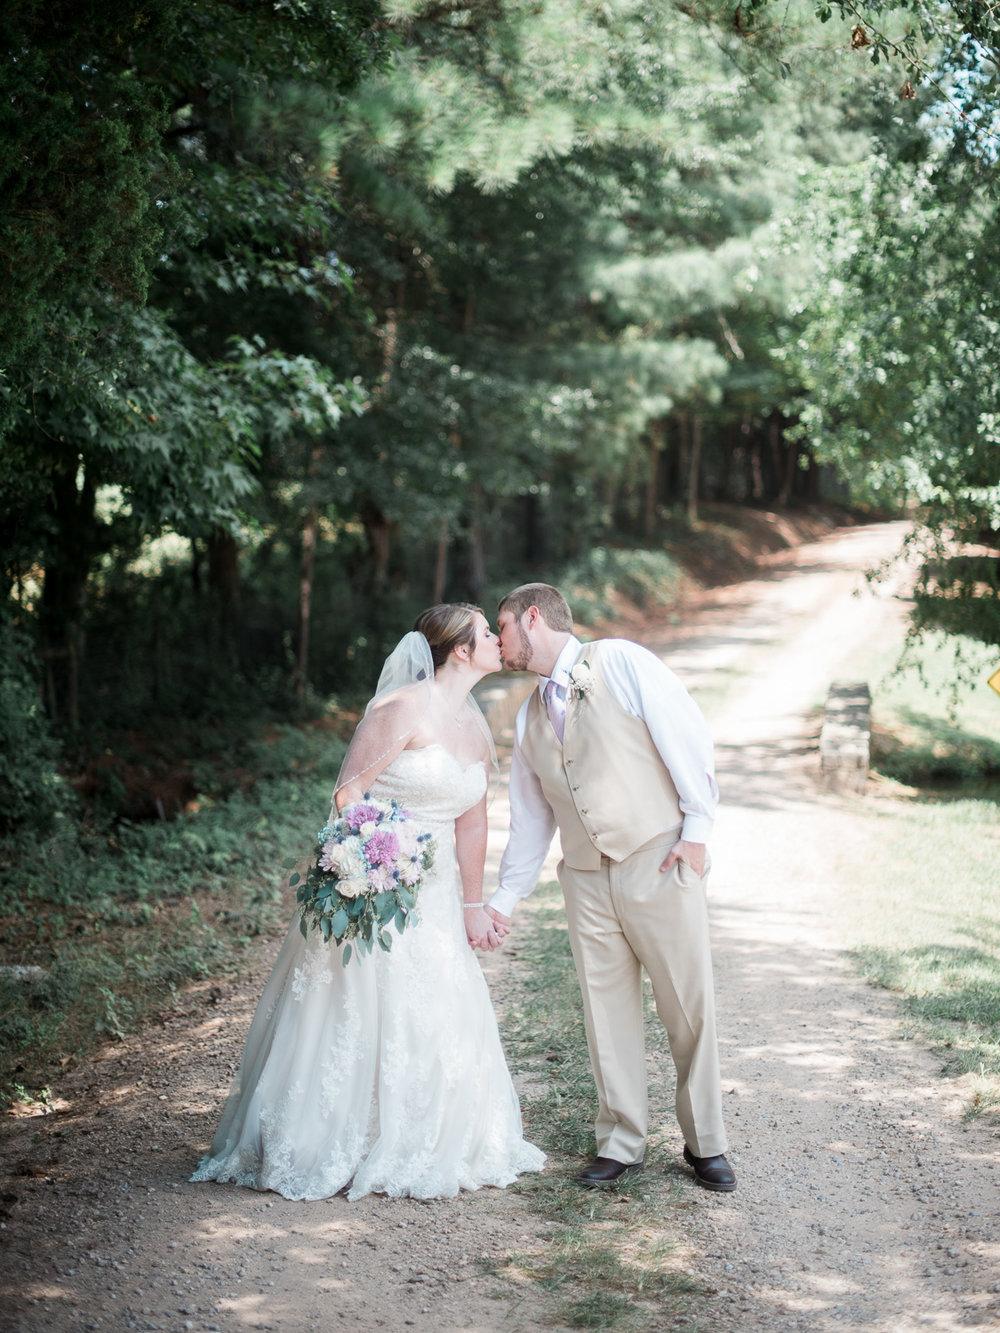 taryntyler-bride&groomportraits-christinadavisphoto34.jpg